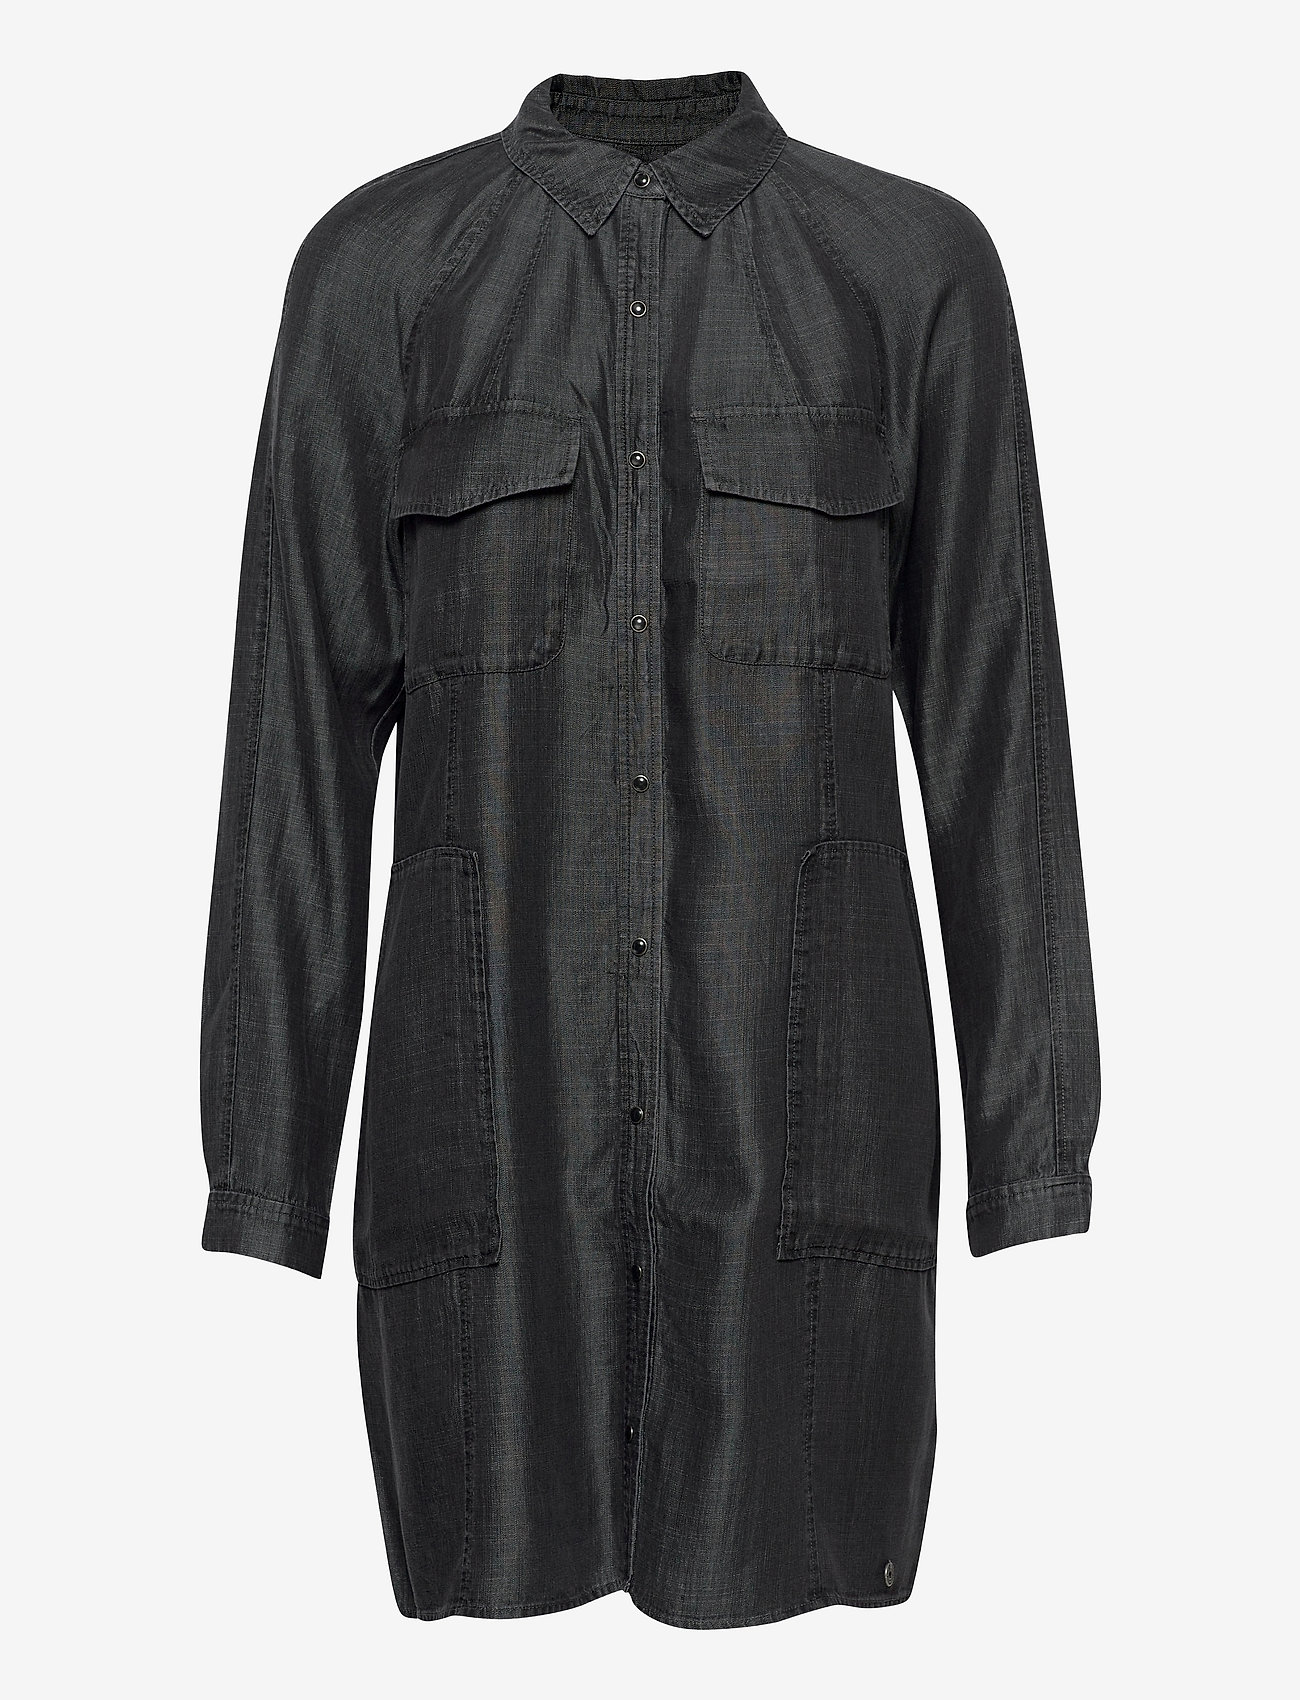 Superdry - TENCEL OVERSIZED SHIRT DRESS - everyday dresses - black wash - 0